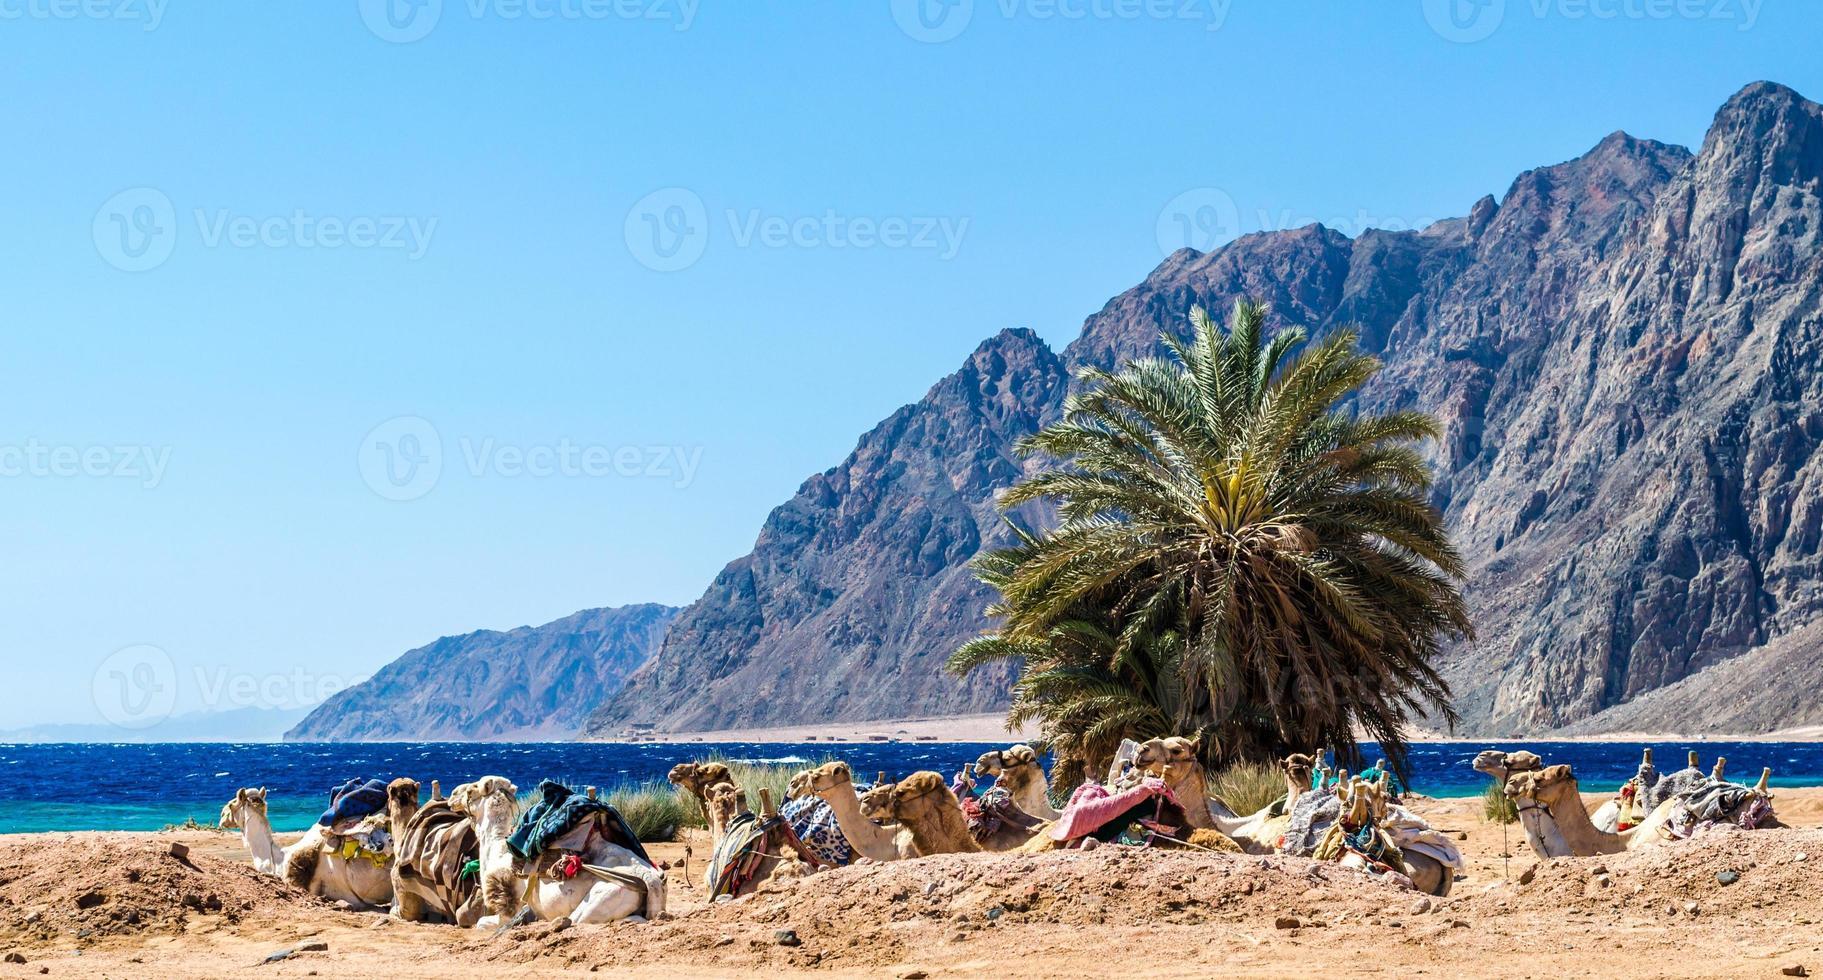 kamelen in het zand foto